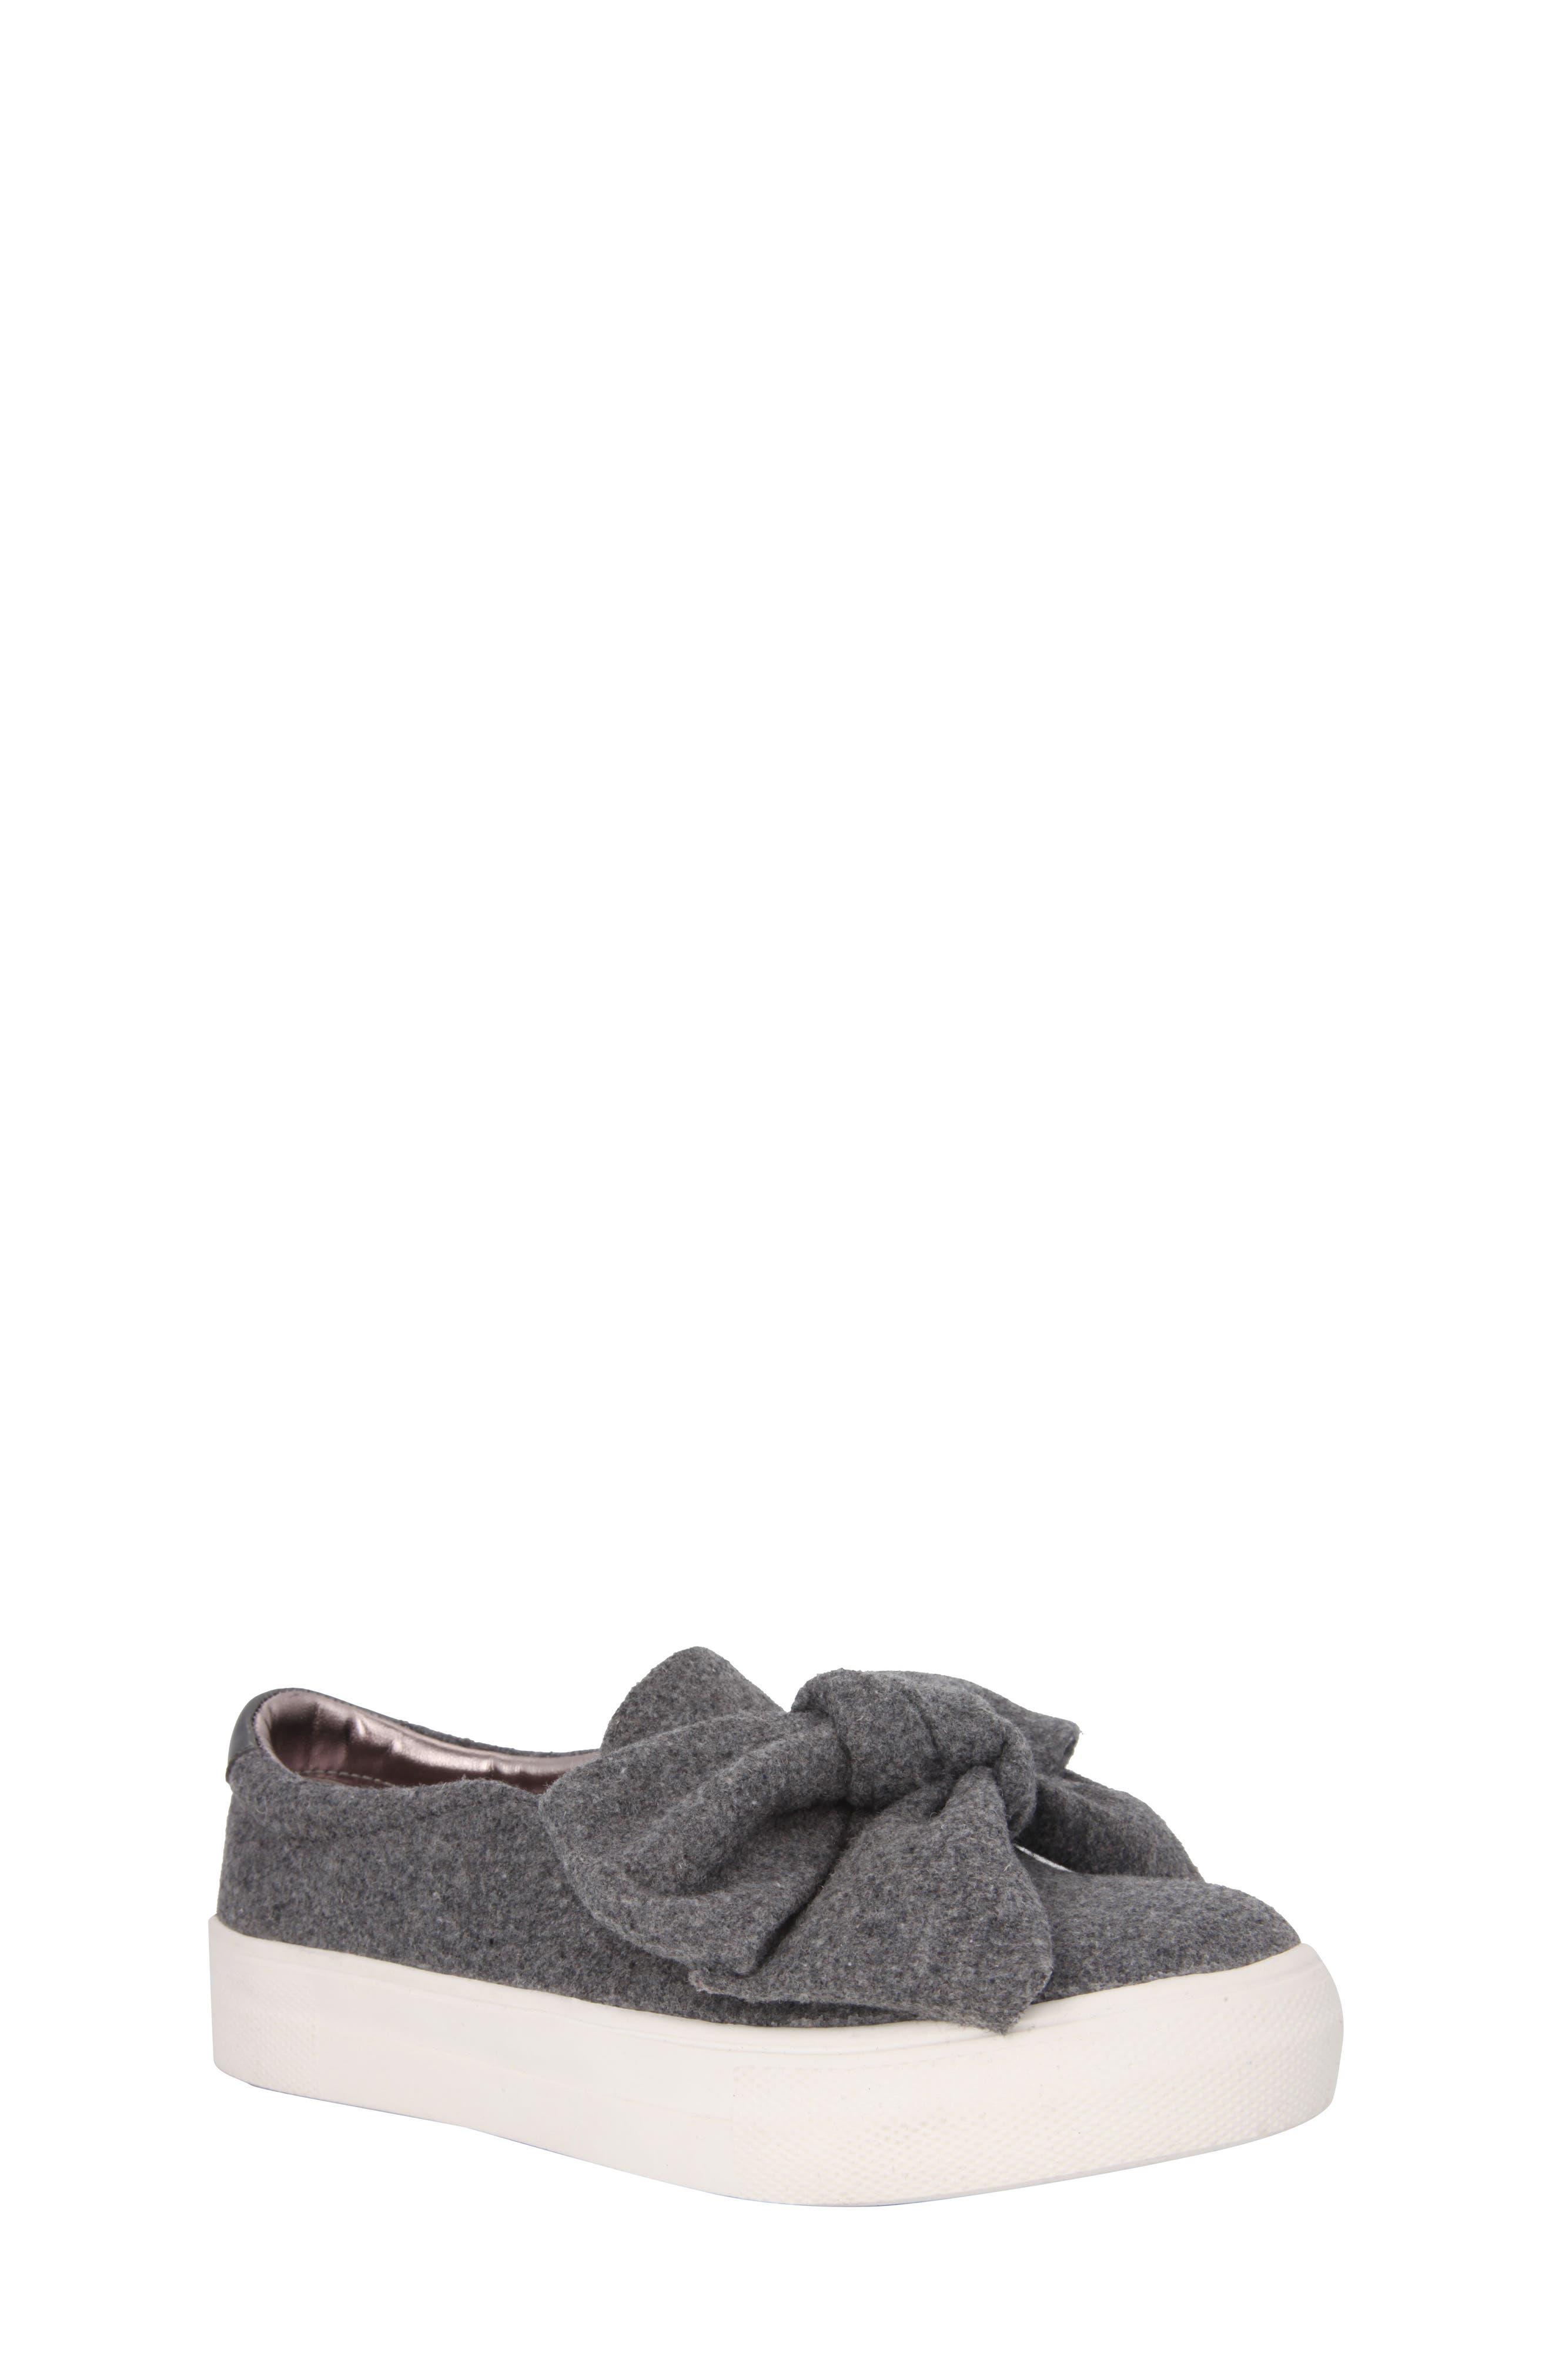 Vaneza Slip-On Bow Sneaker,                         Main,                         color, Grey Flannel